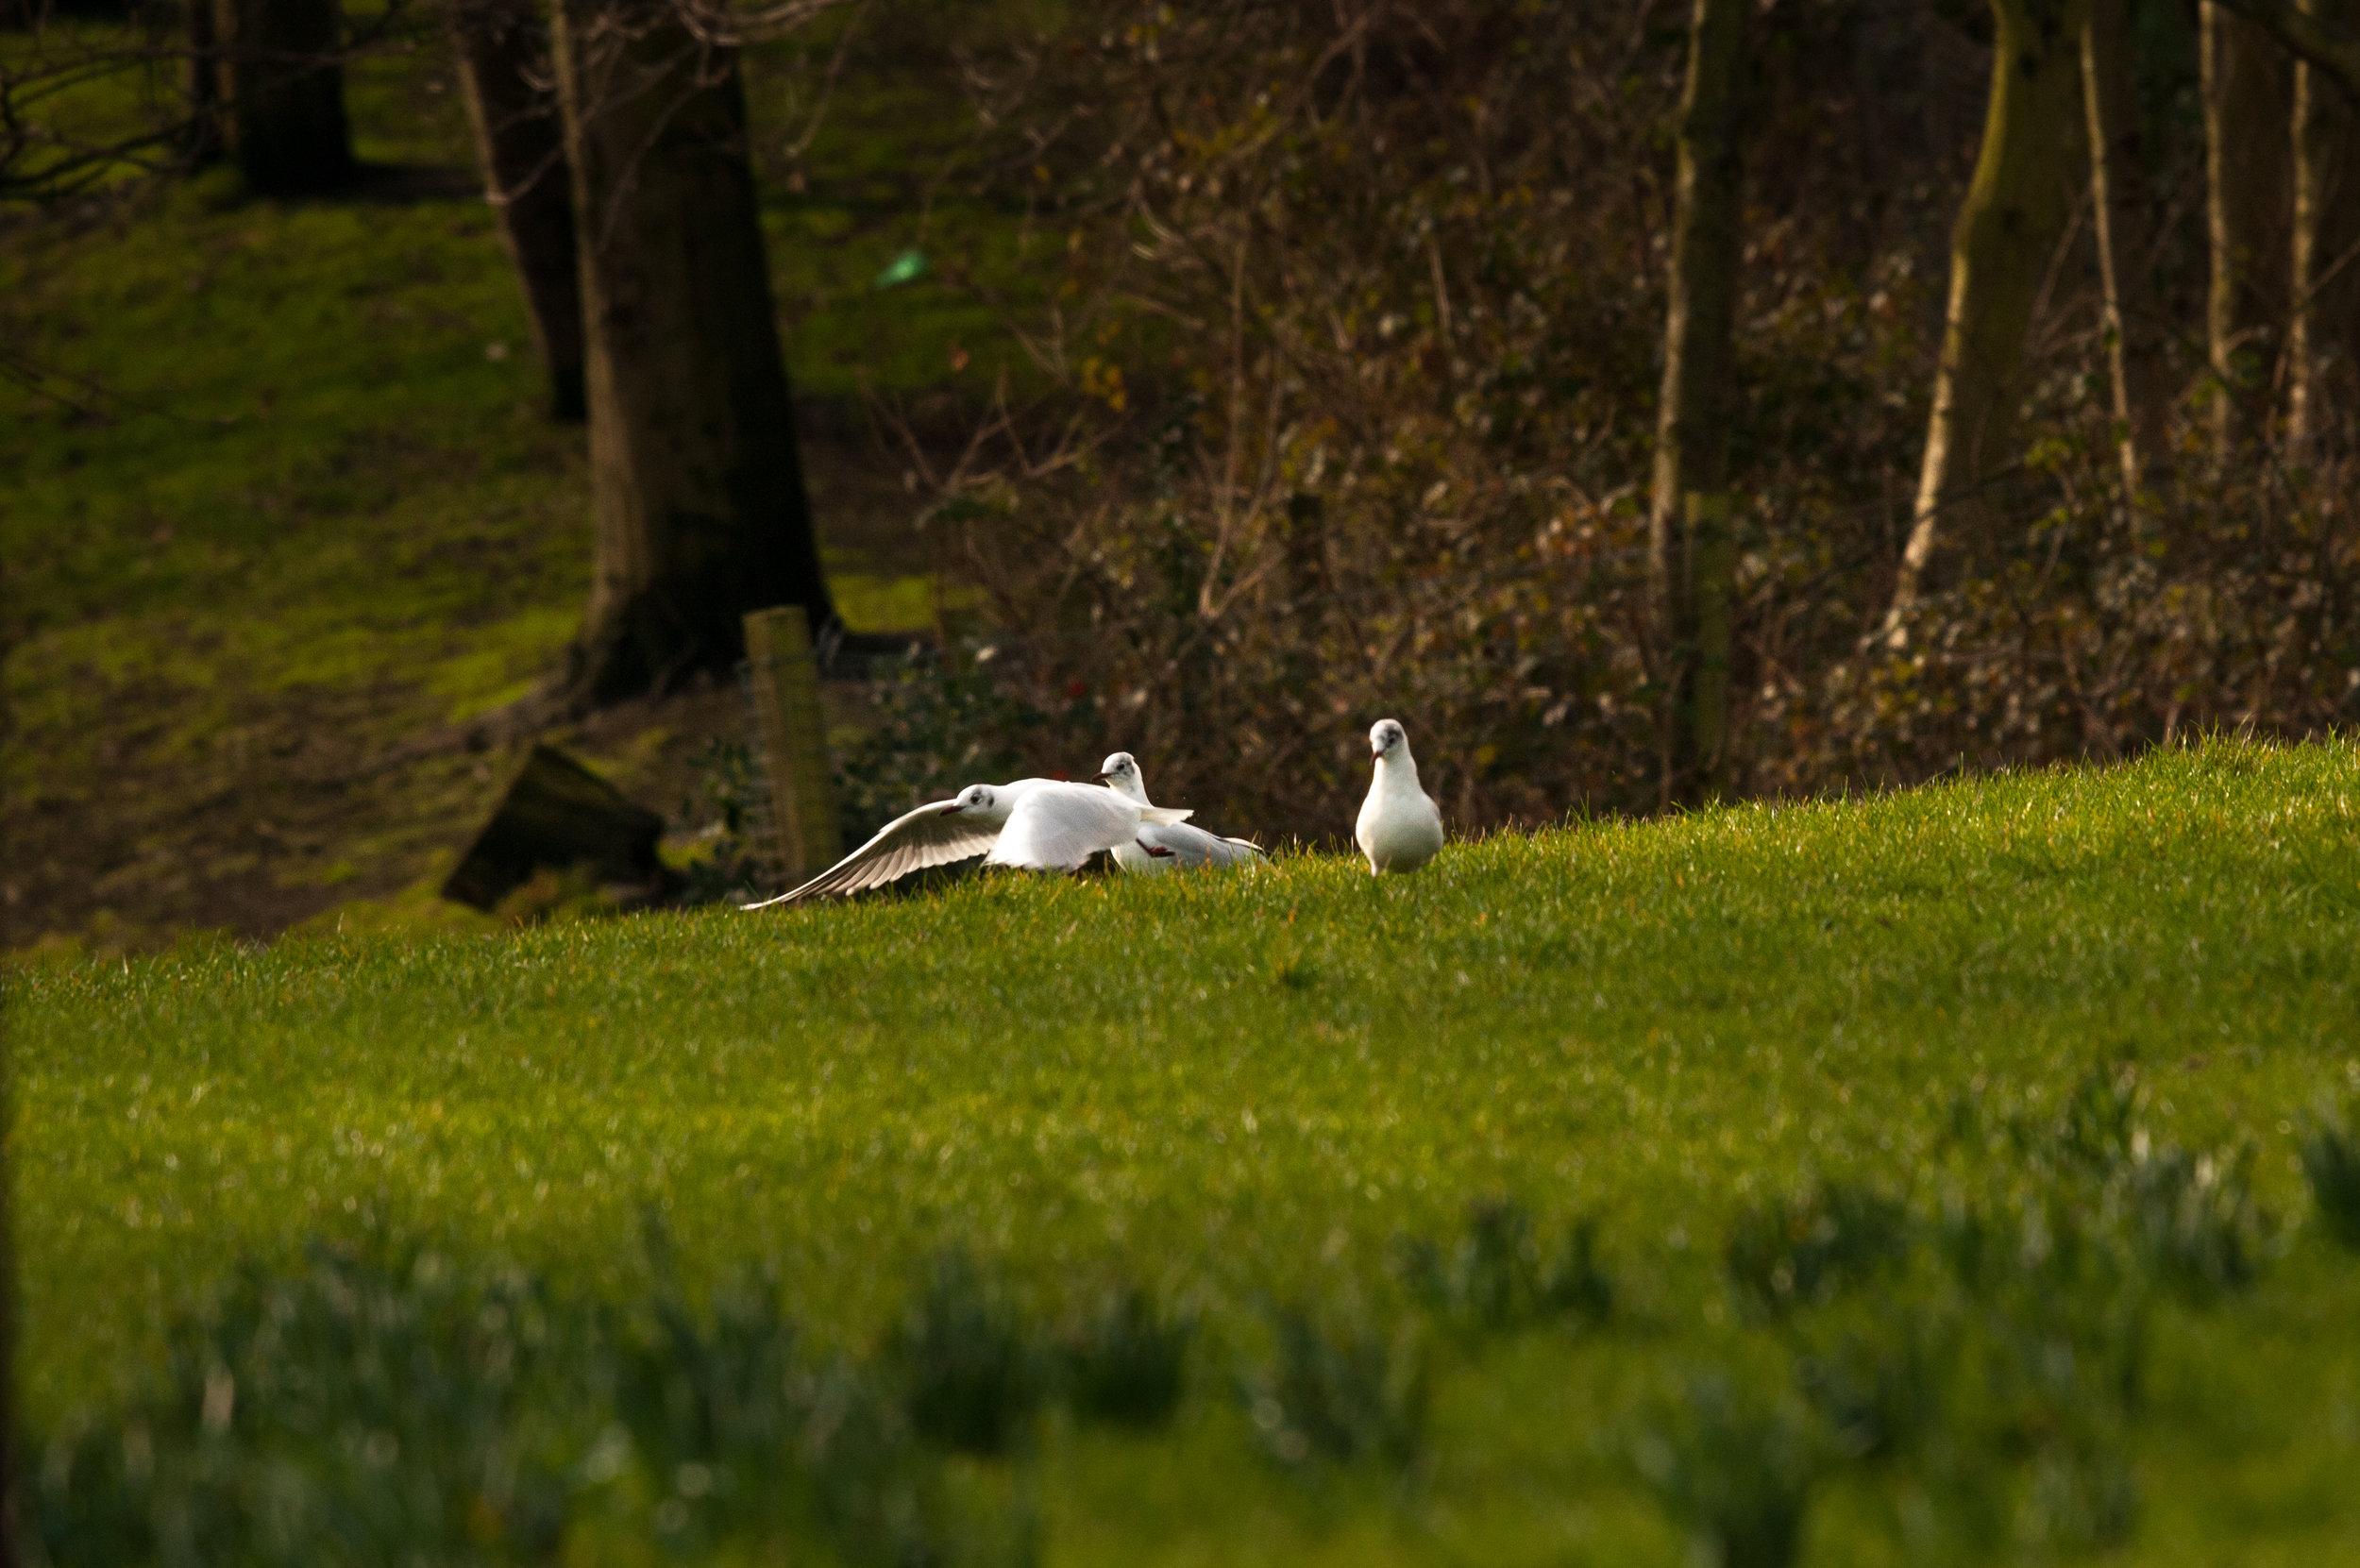 Ptaki Lochend - 2019 - MAR_4509-2.jpg